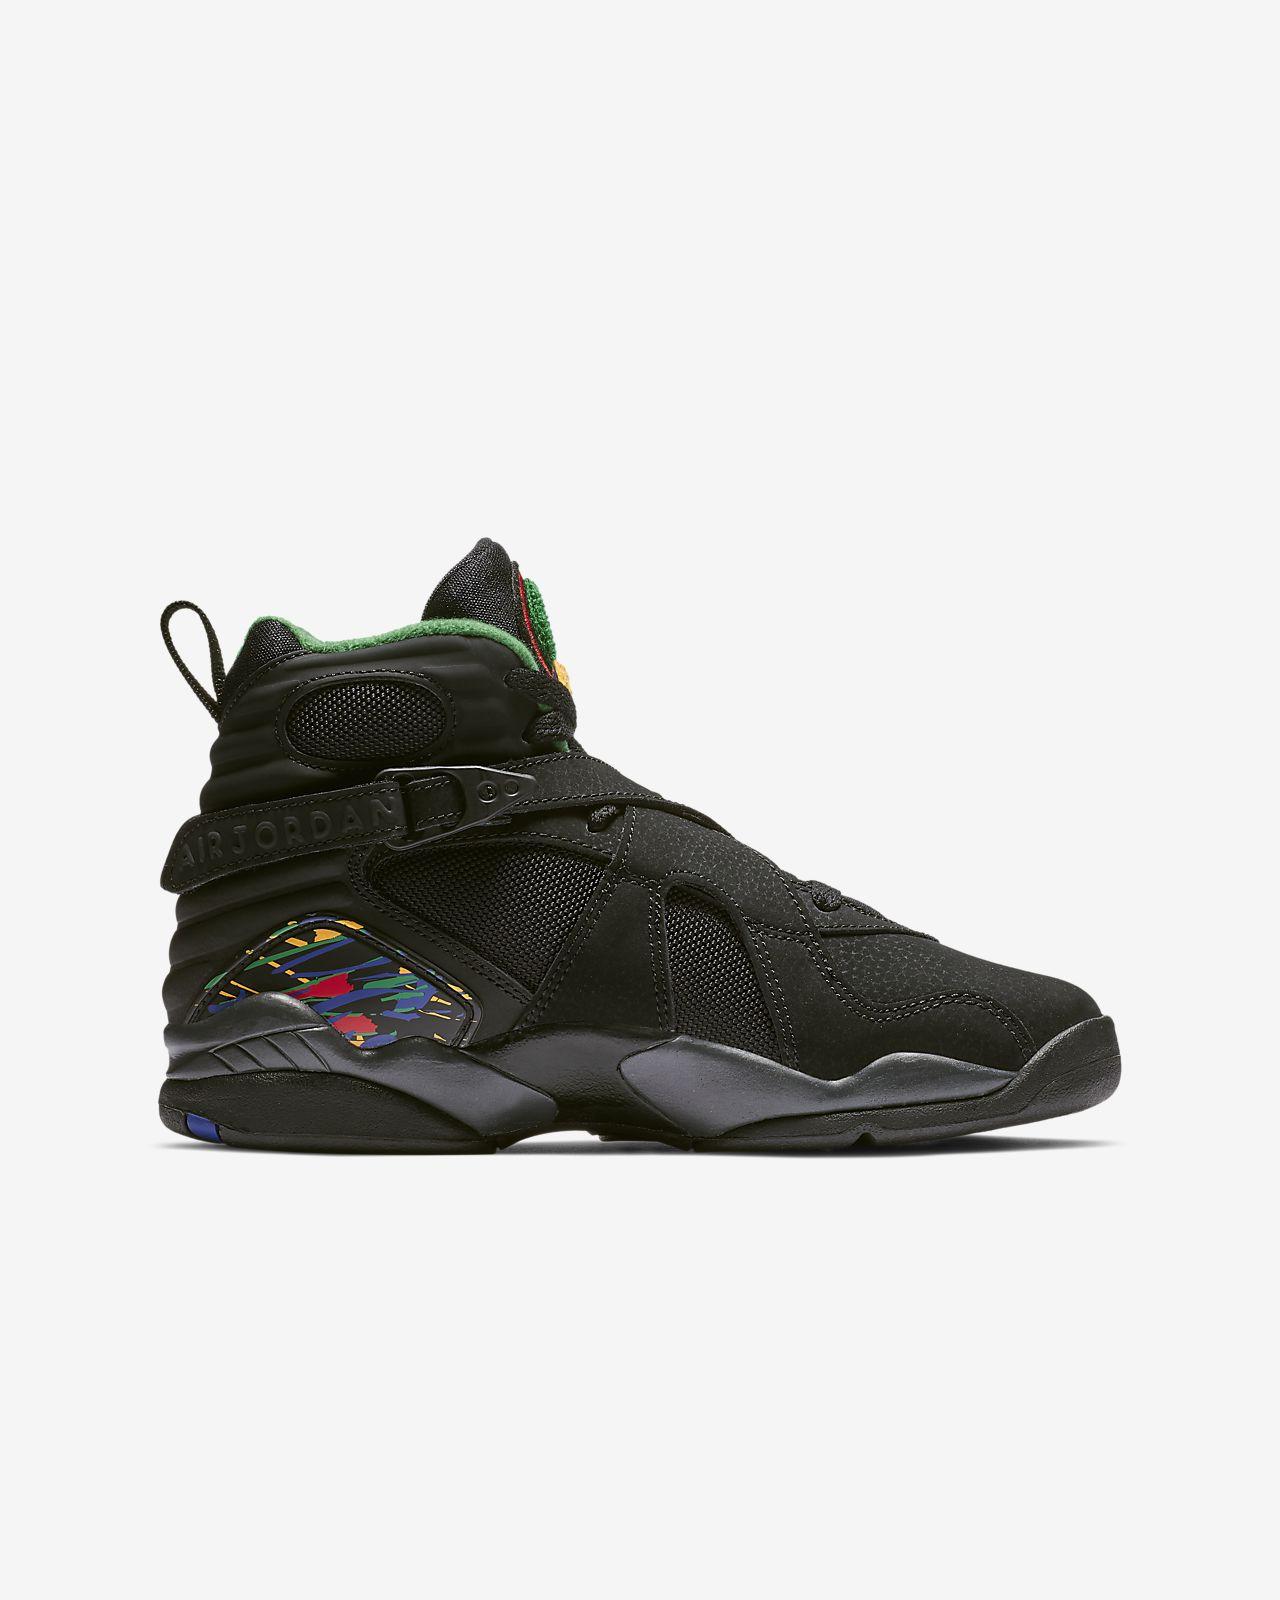 timeless design 201a4 316c0 ... Air Jordan Retro 8 Big Kids  Shoe